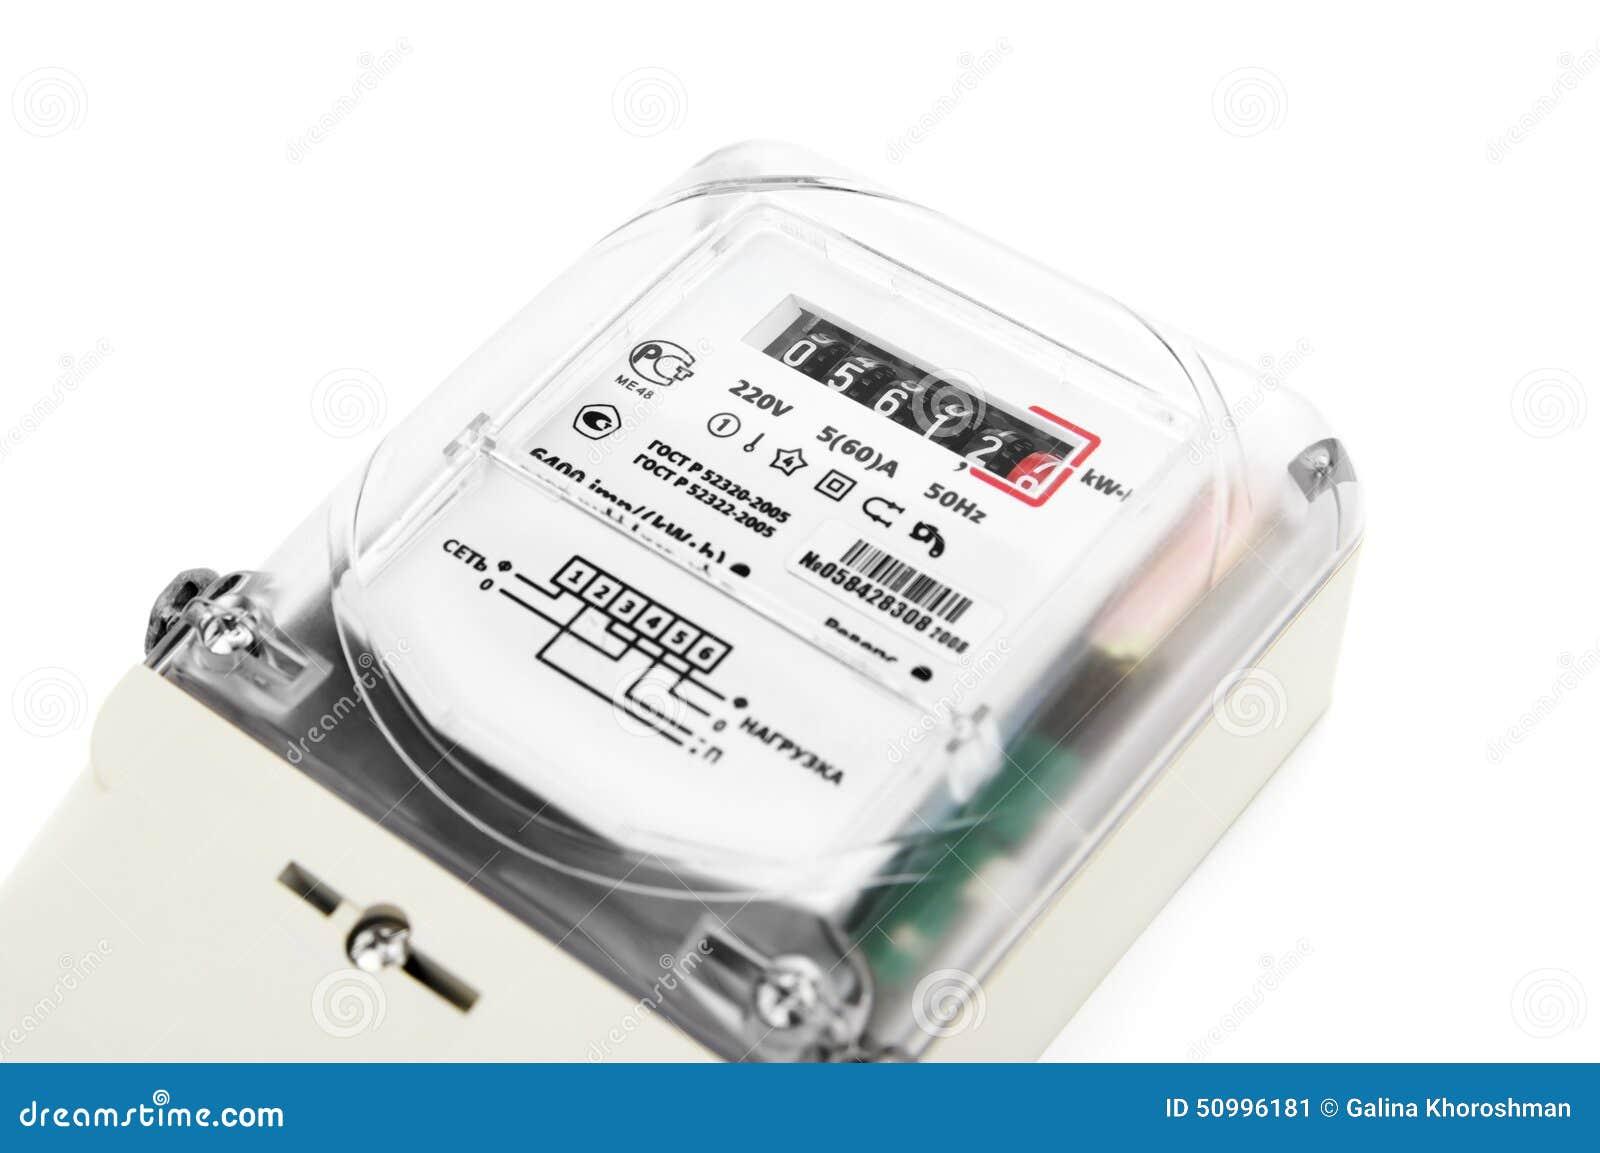 Power Meter Cartoon : Electricity meter royalty free stock photo cartoondealer